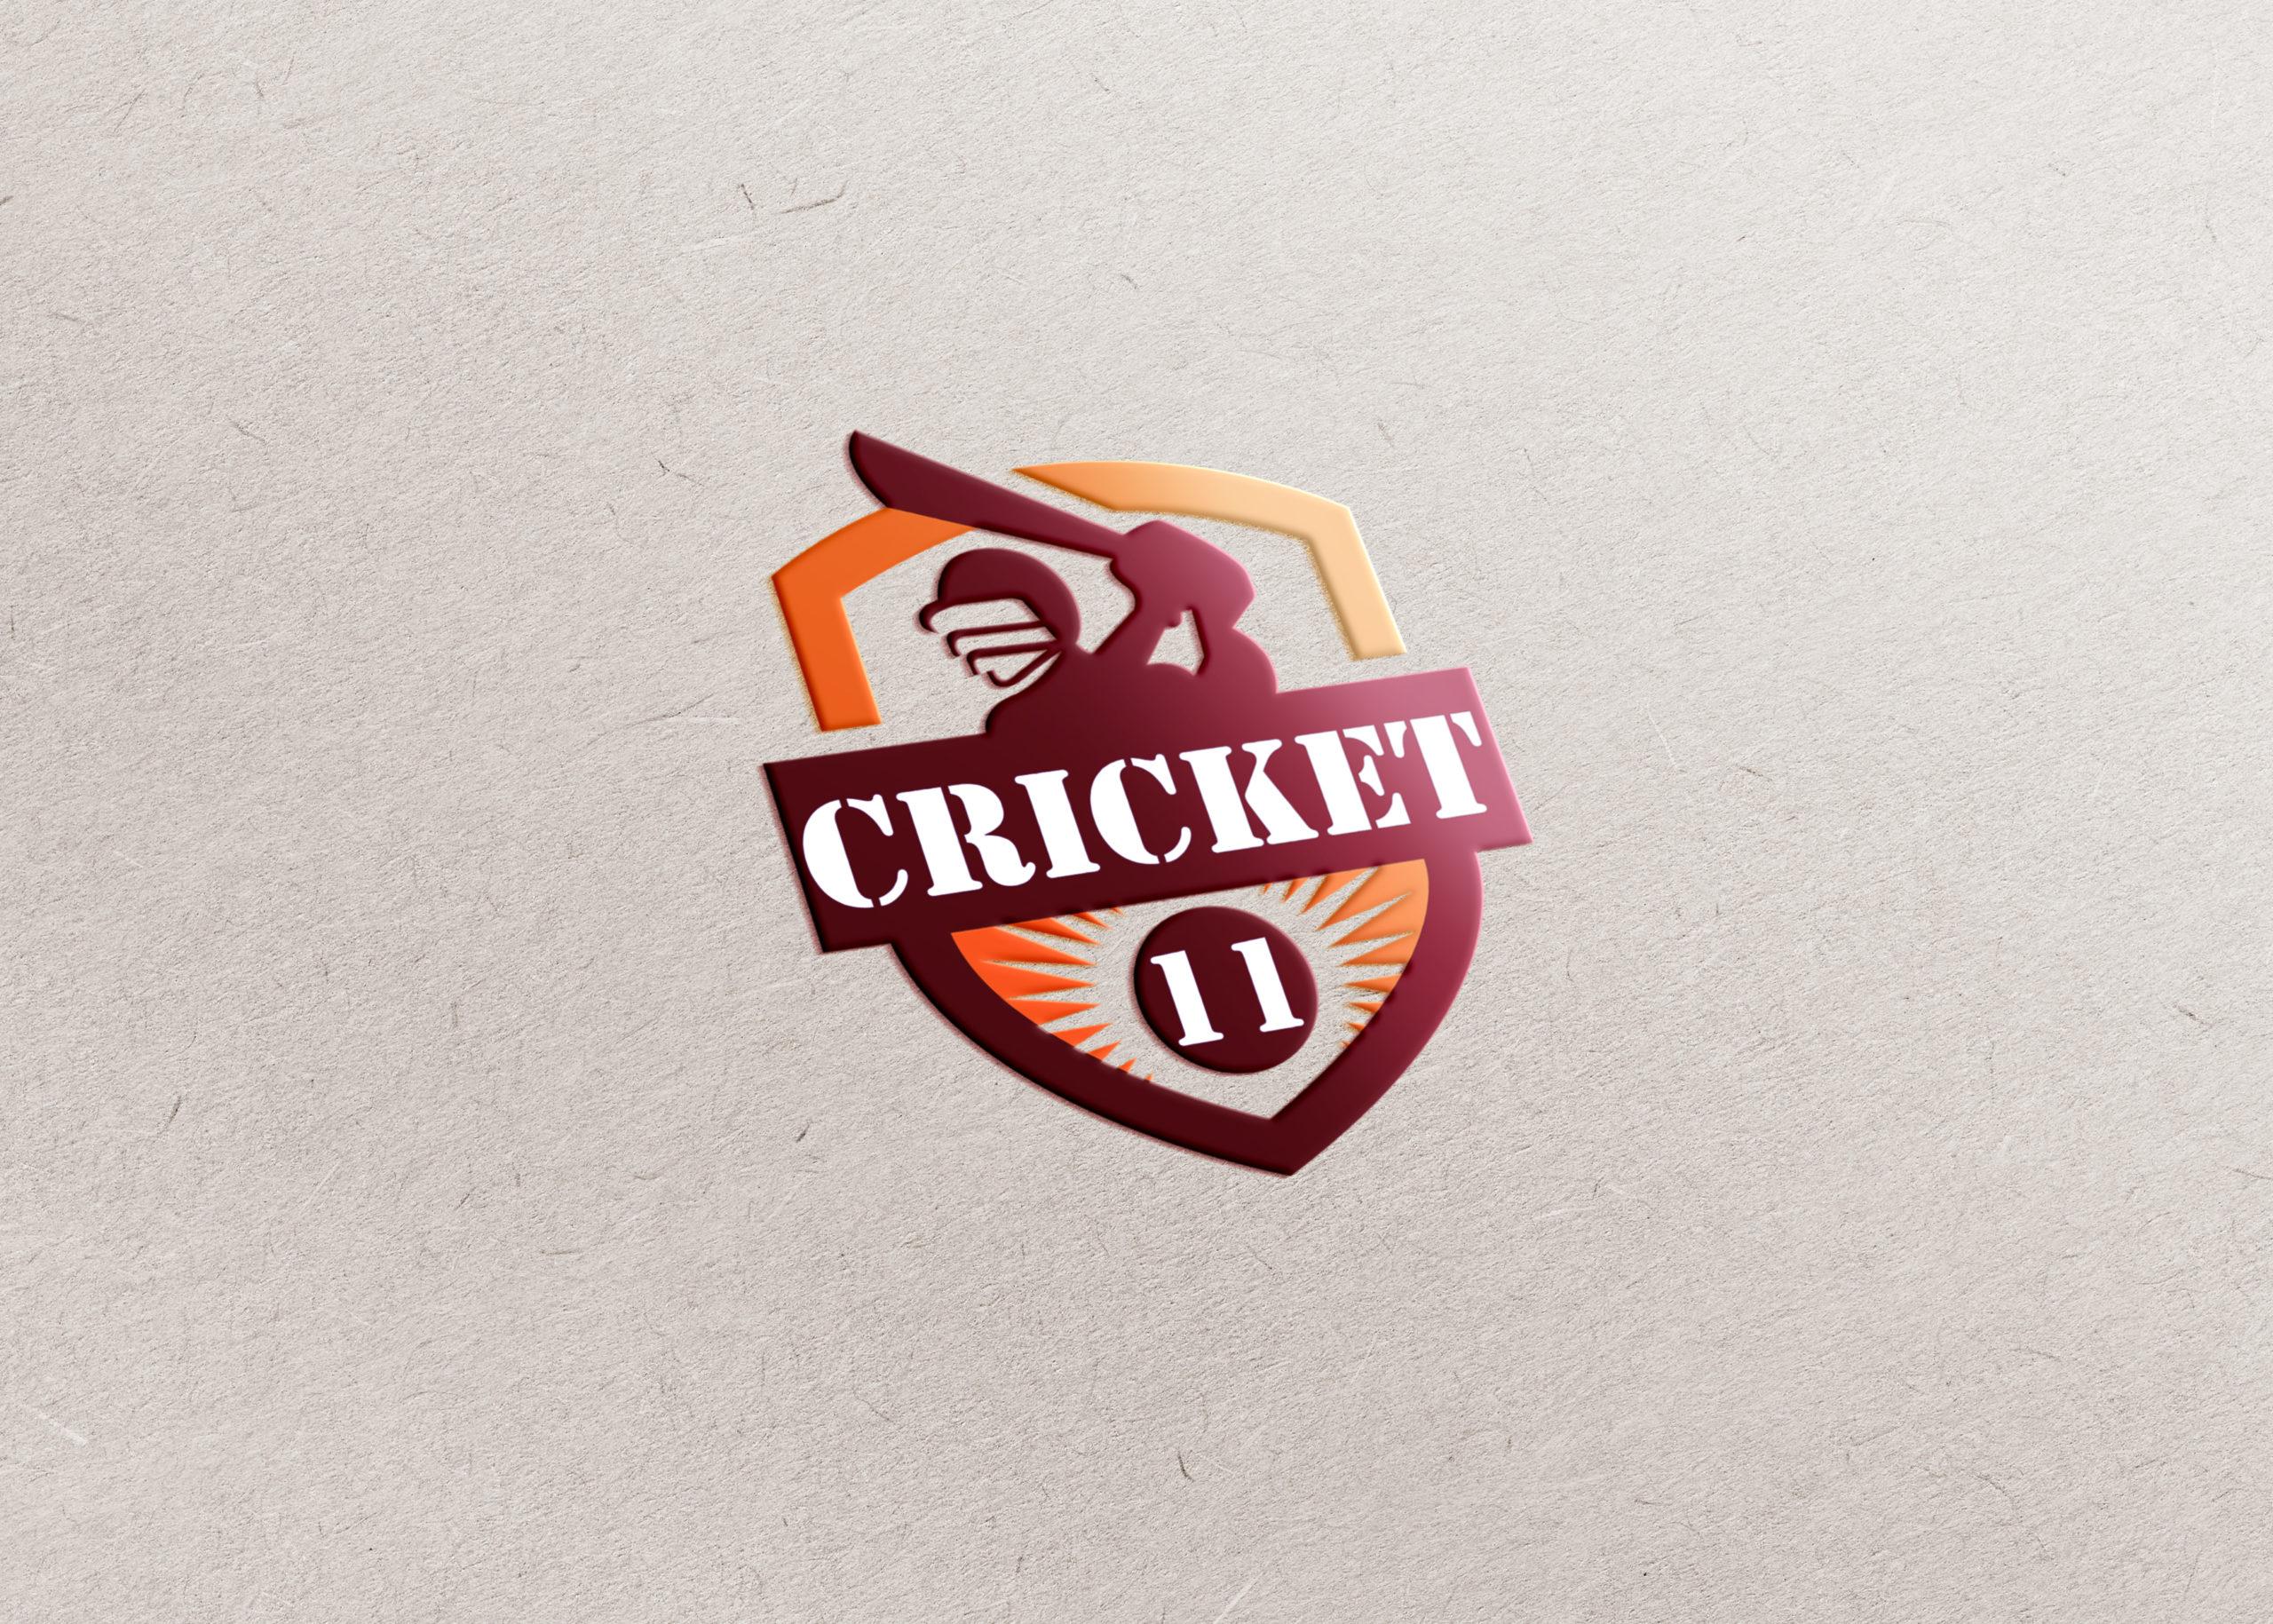 online cricket game app logo design by Badri Design